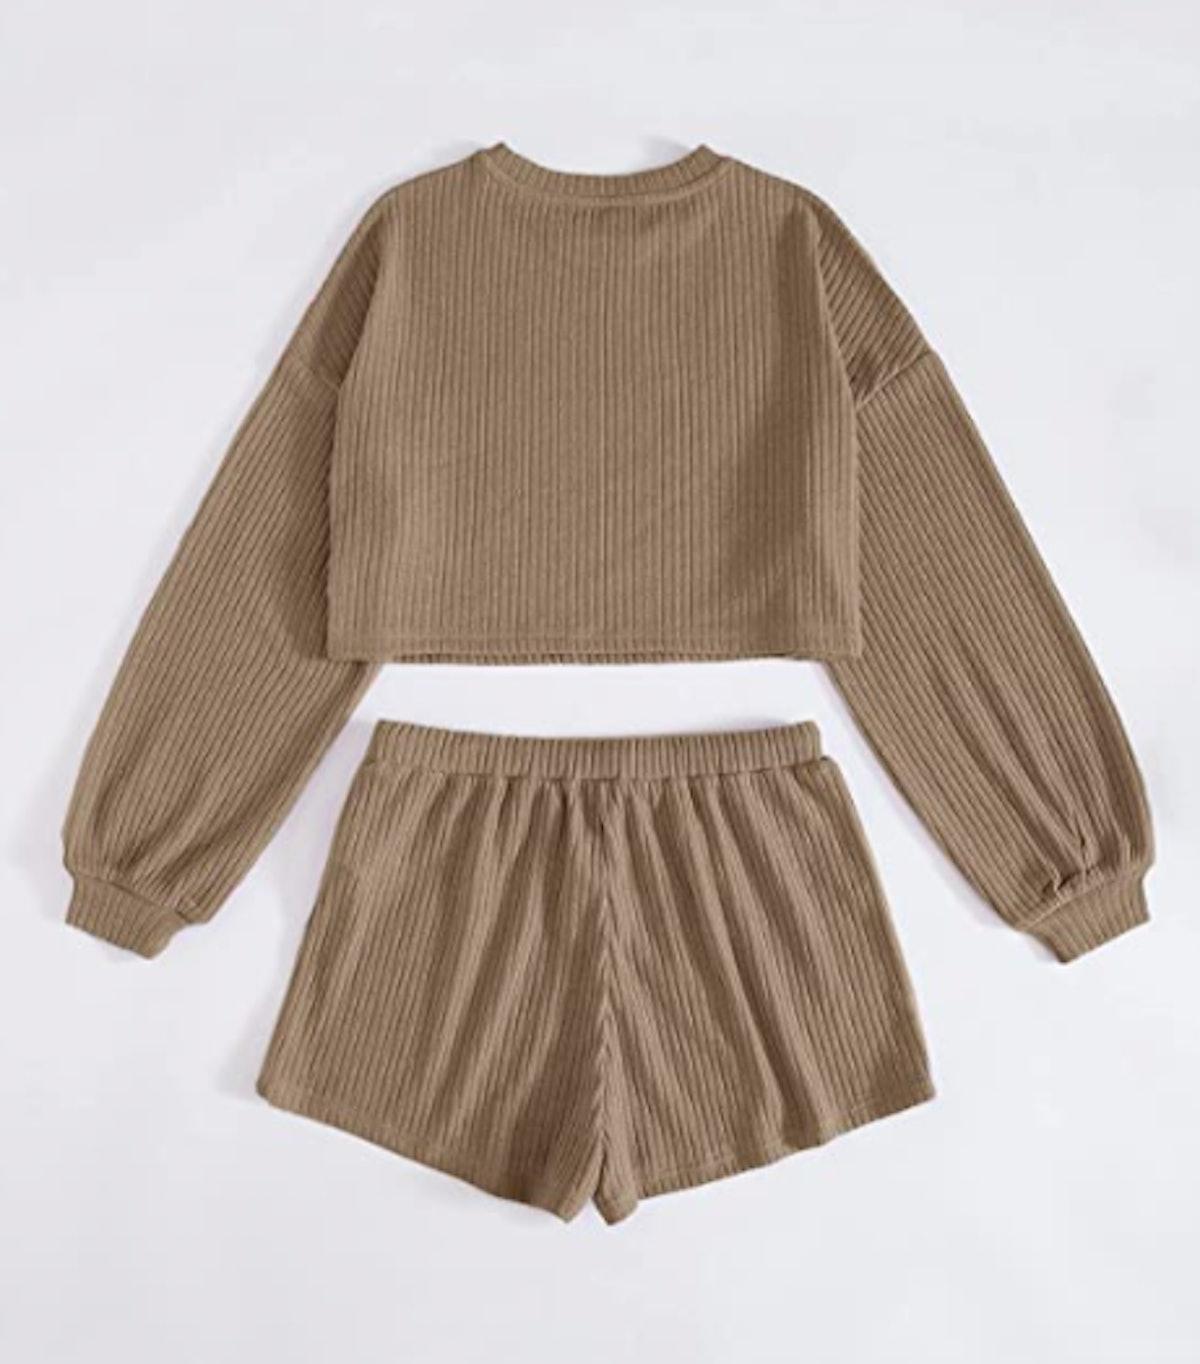 Verdusa Rib Knit Crop Top & Shorts Lounge Set